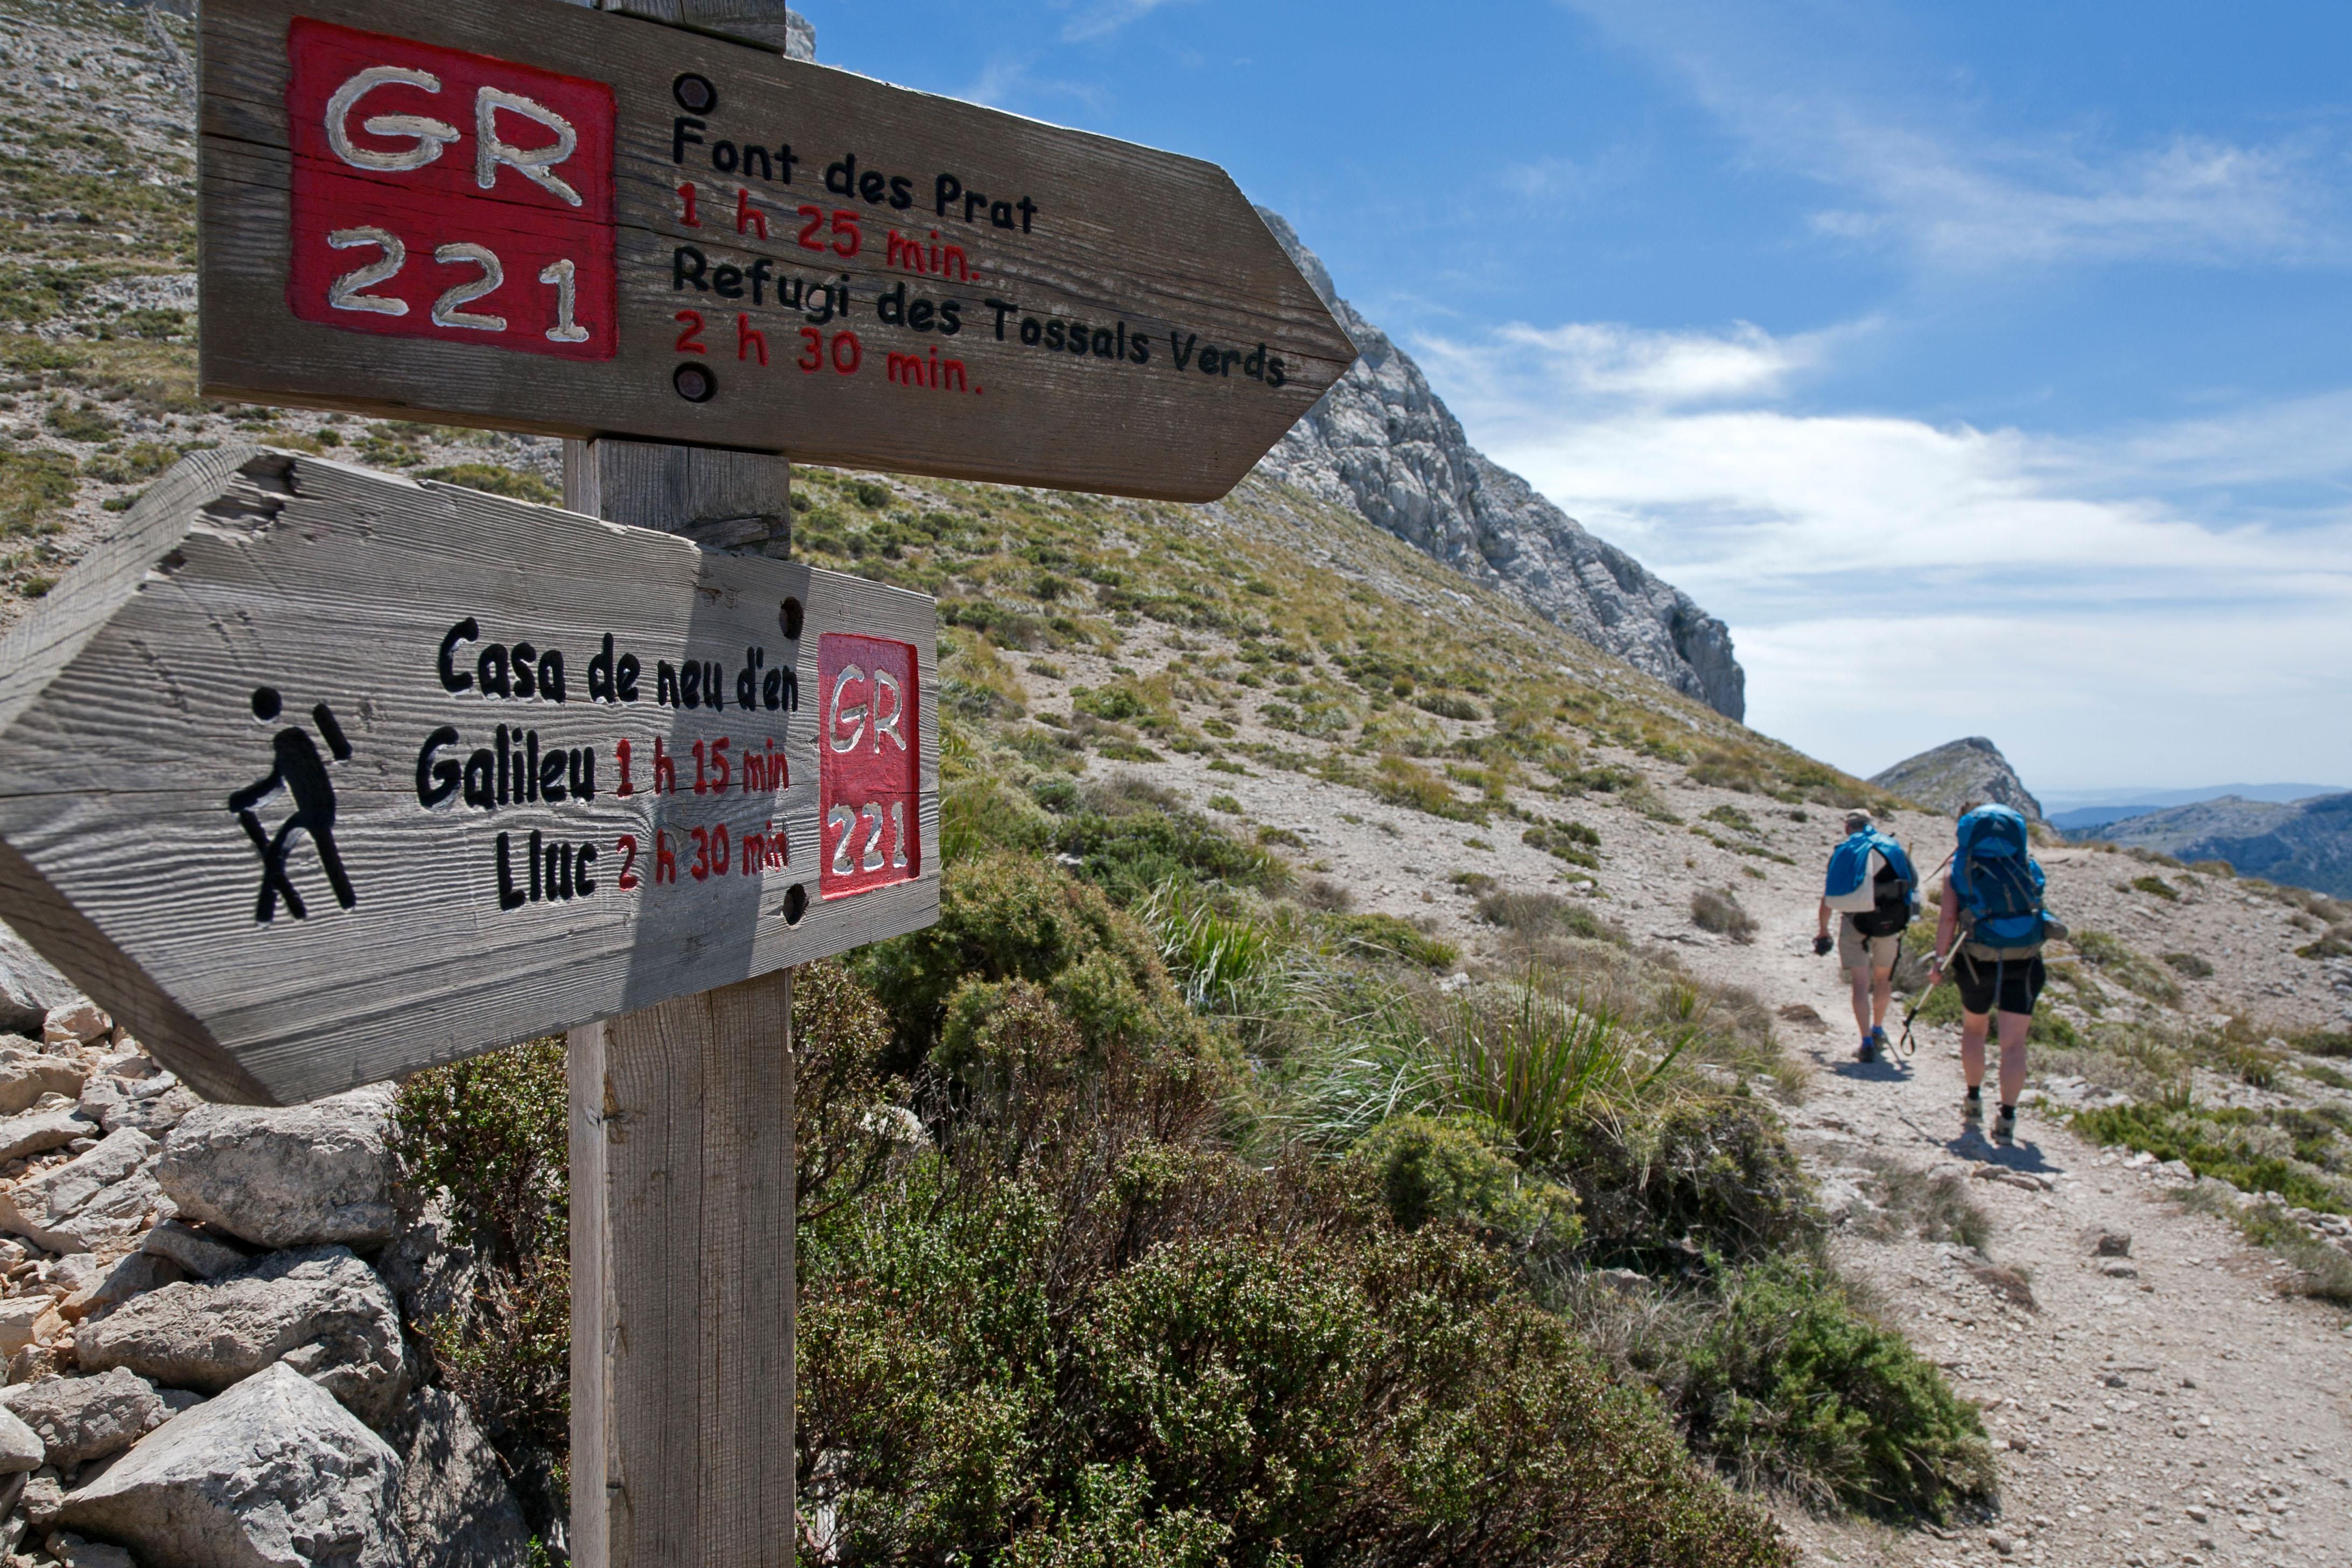 Trekking rute på Mallorca (Foto: All Over)